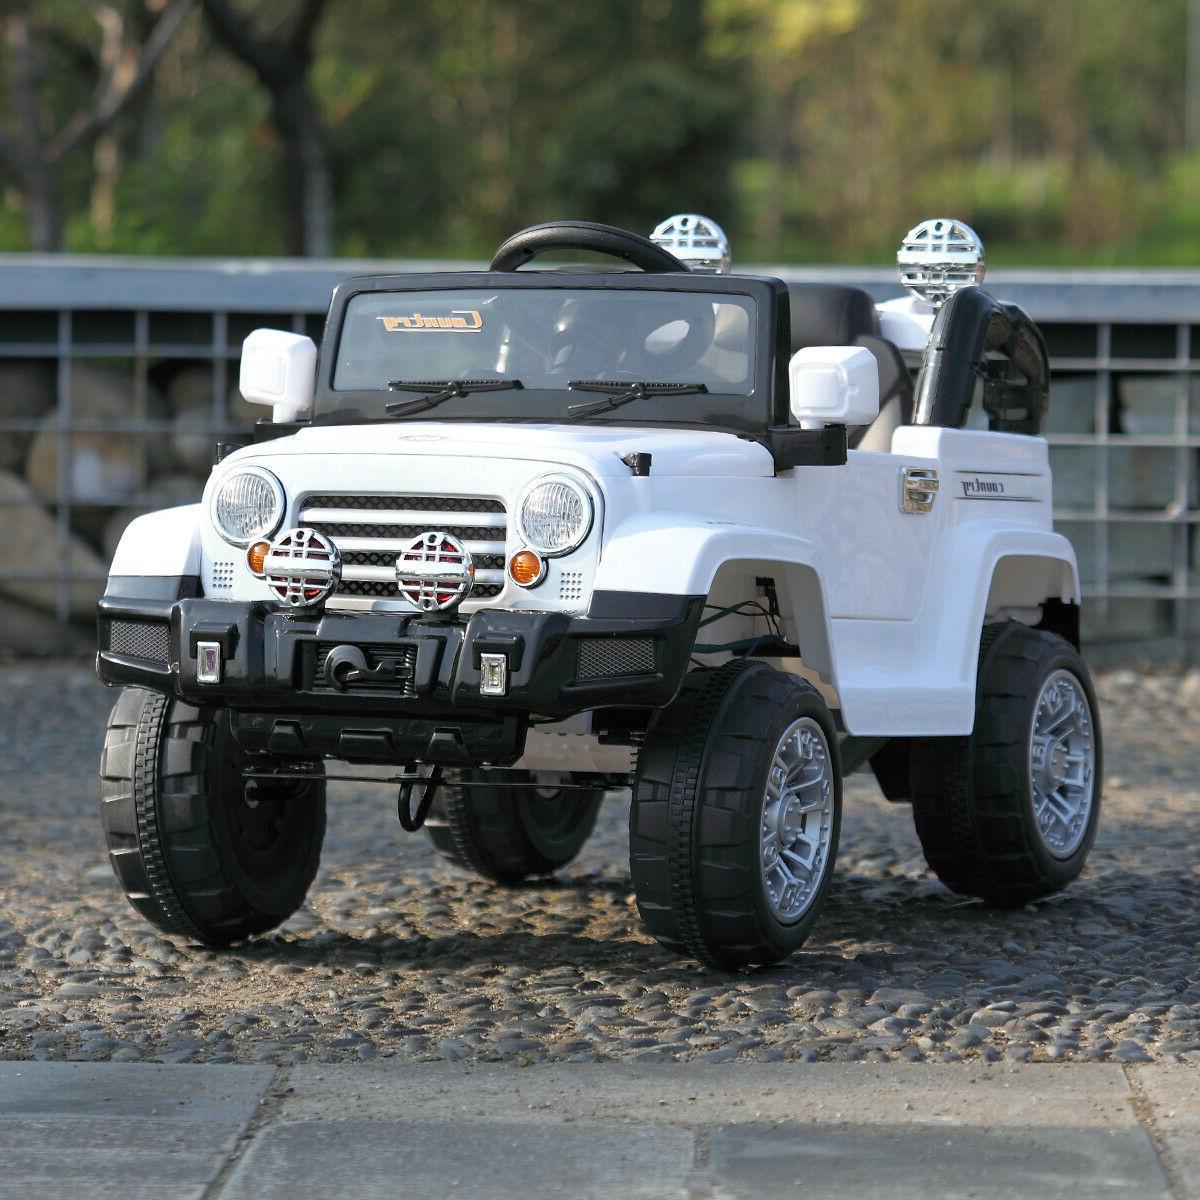 12v mp3 battery jeep car truck remote